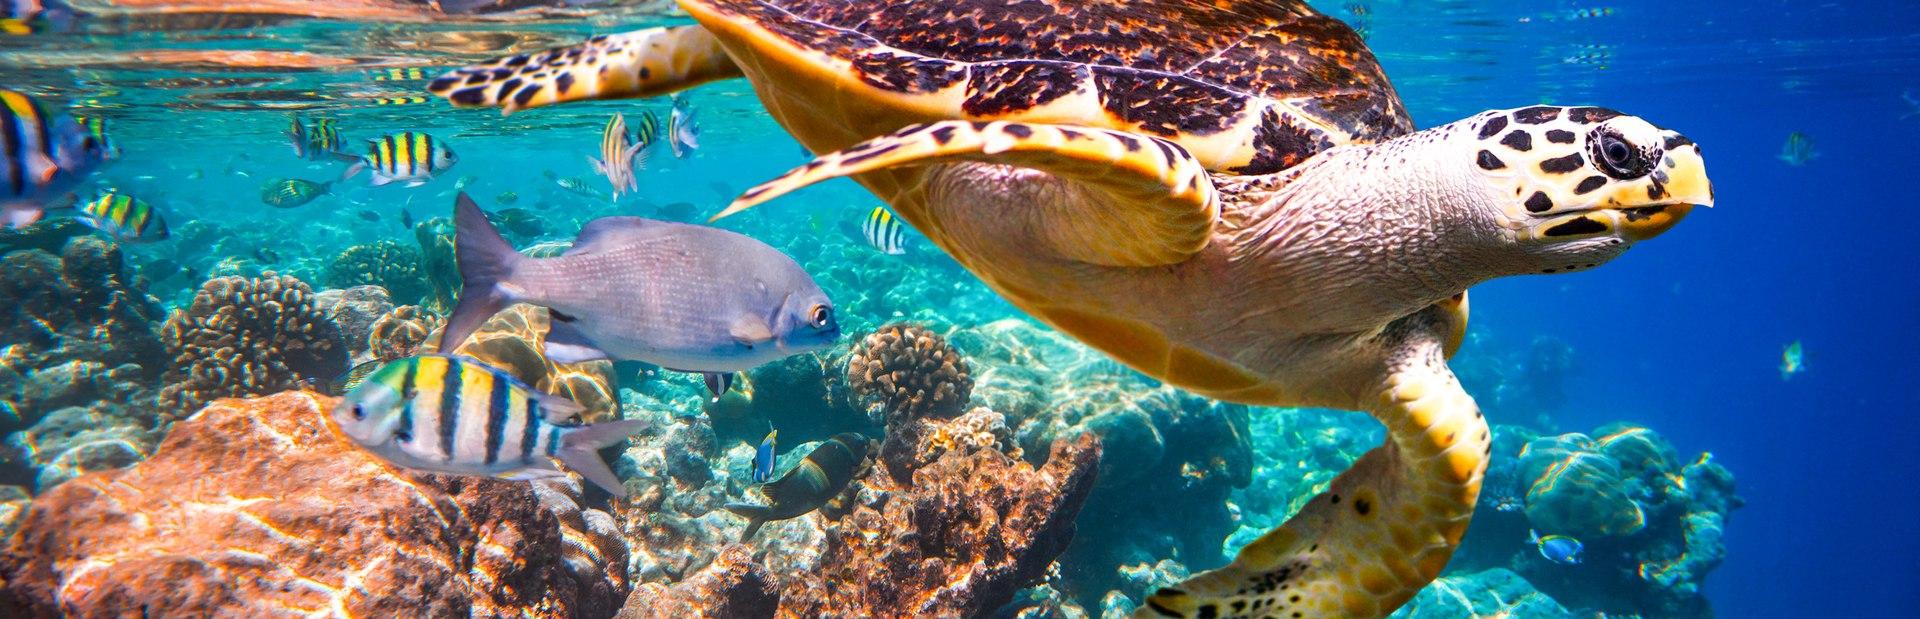 Maldives photo tour